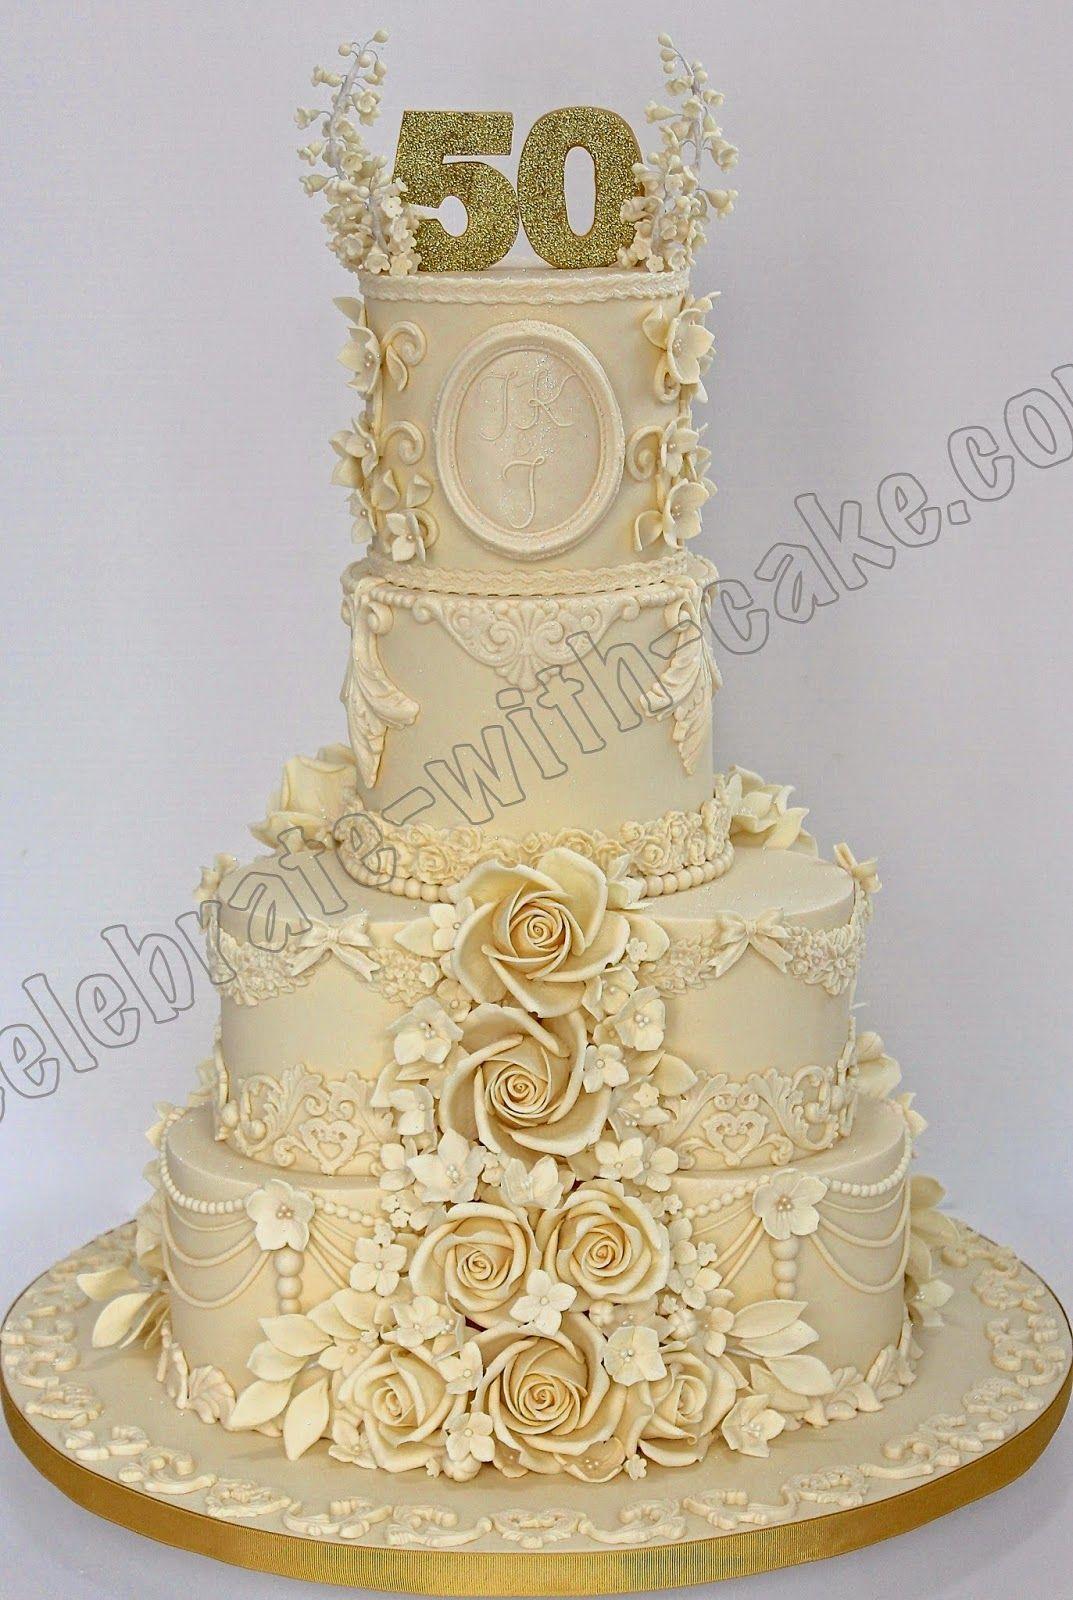 Celebrate with Cake! | tortas boda de oro | Pinterest | Cake and Cup ...